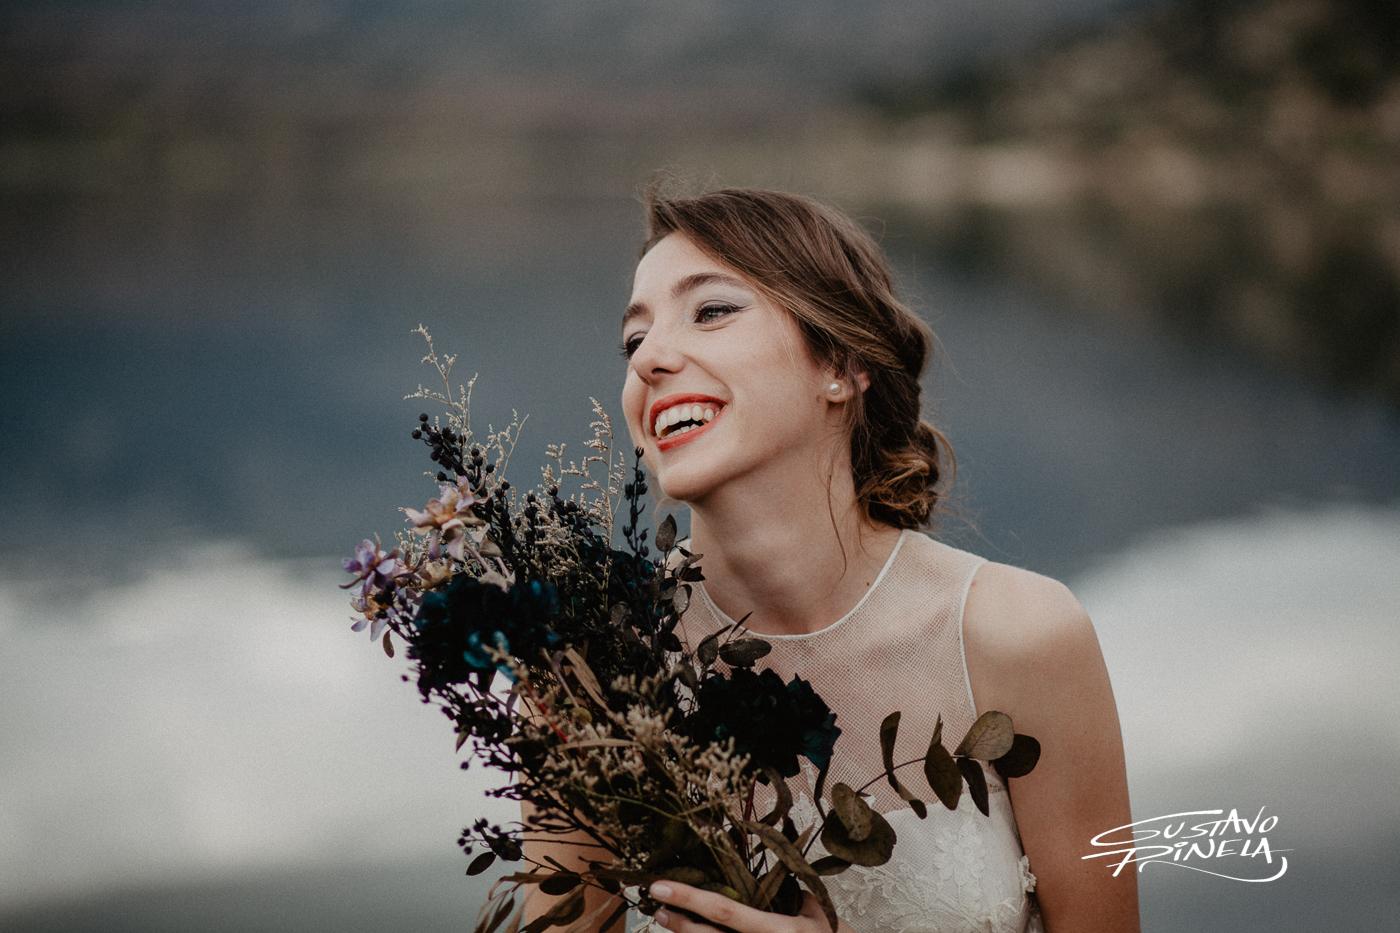 Bodas - Gustavo Pinela. Fotografía de bodas tan naturales como tu